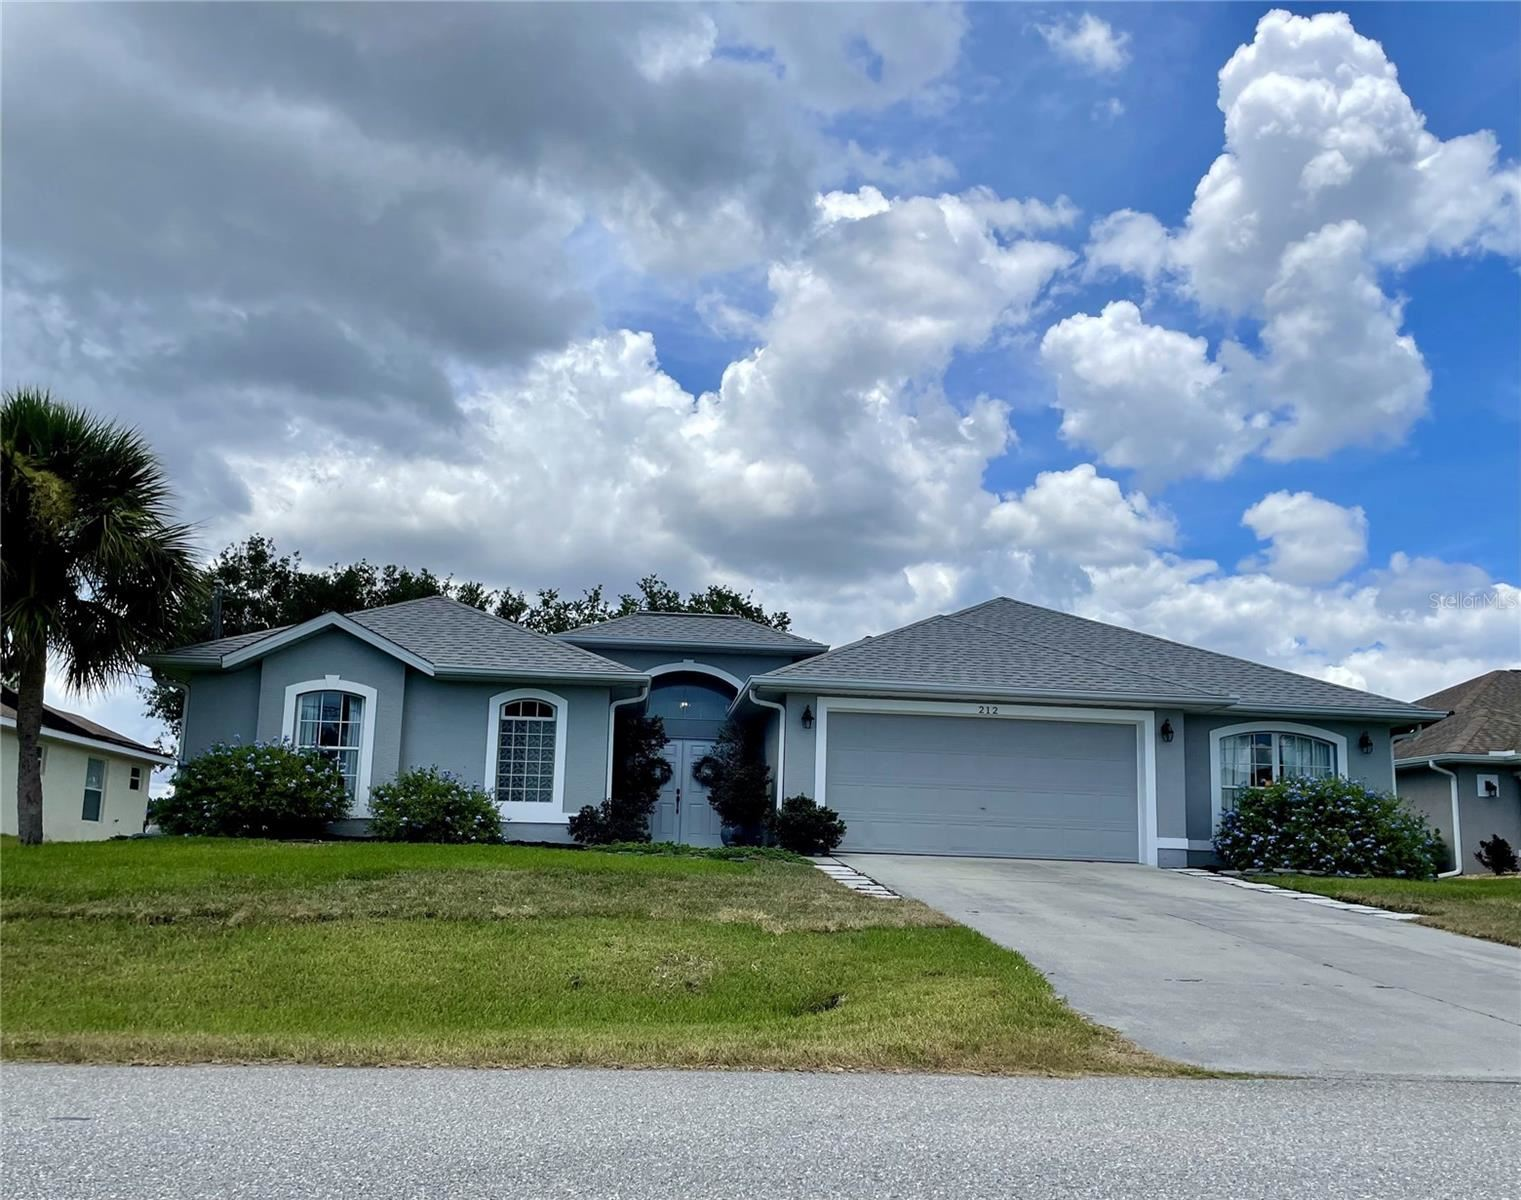 Photo of 212 MARKER RD, ROTONDA WEST, FL 33947 (MLS # D6119214)